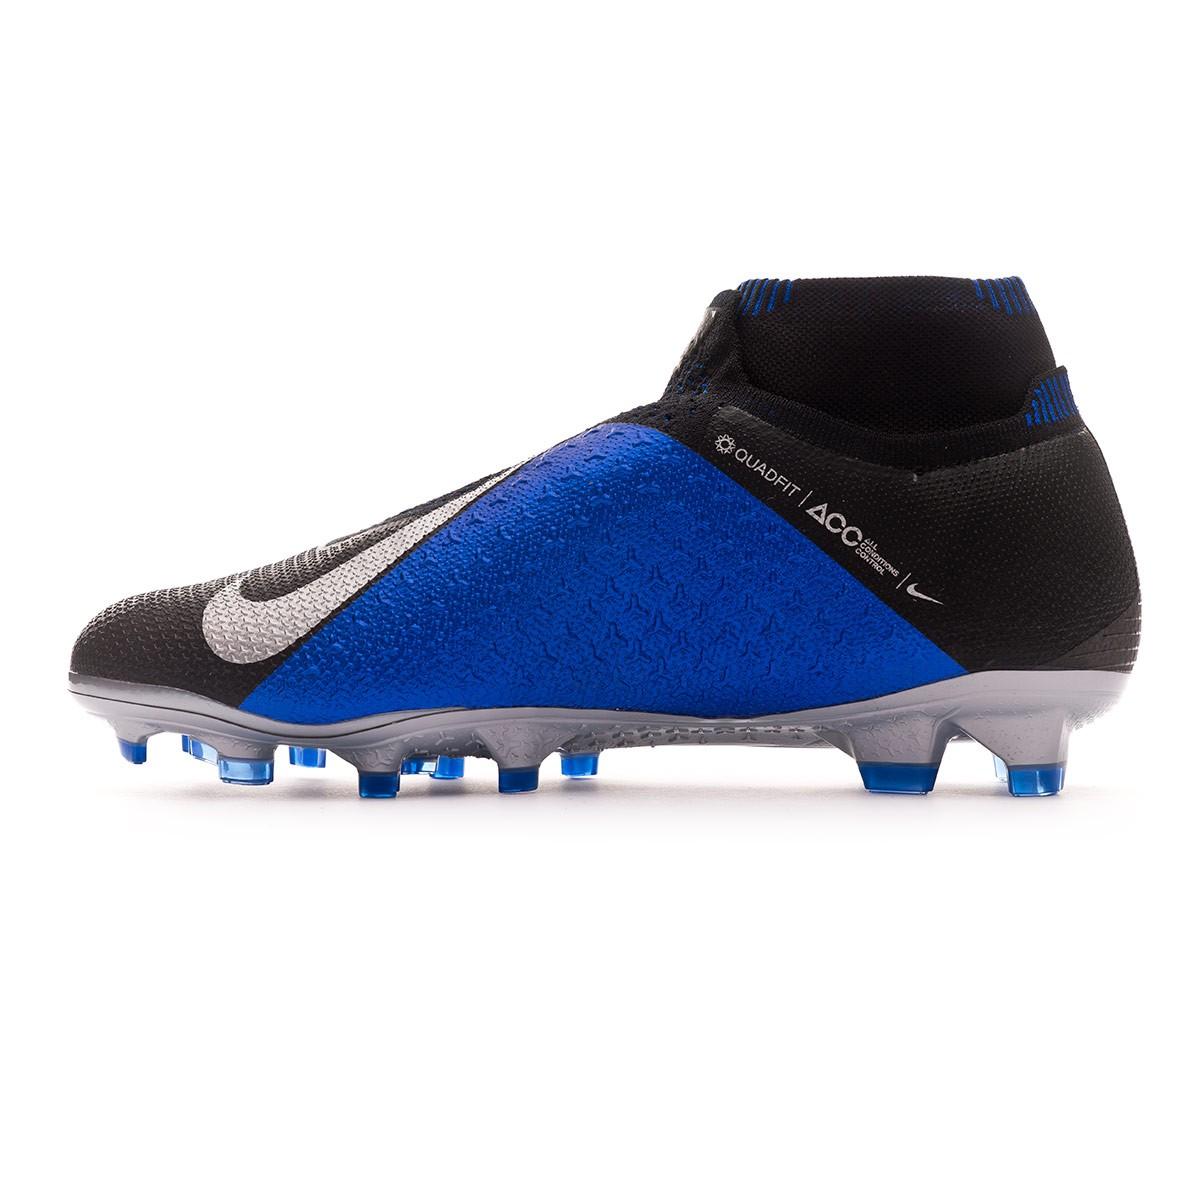 dd8db40db13 Football Boots Nike Phantom Vision Elite DF FG Black-Metallic silver-Racer  blue - Tienda de fútbol Fútbol Emotion